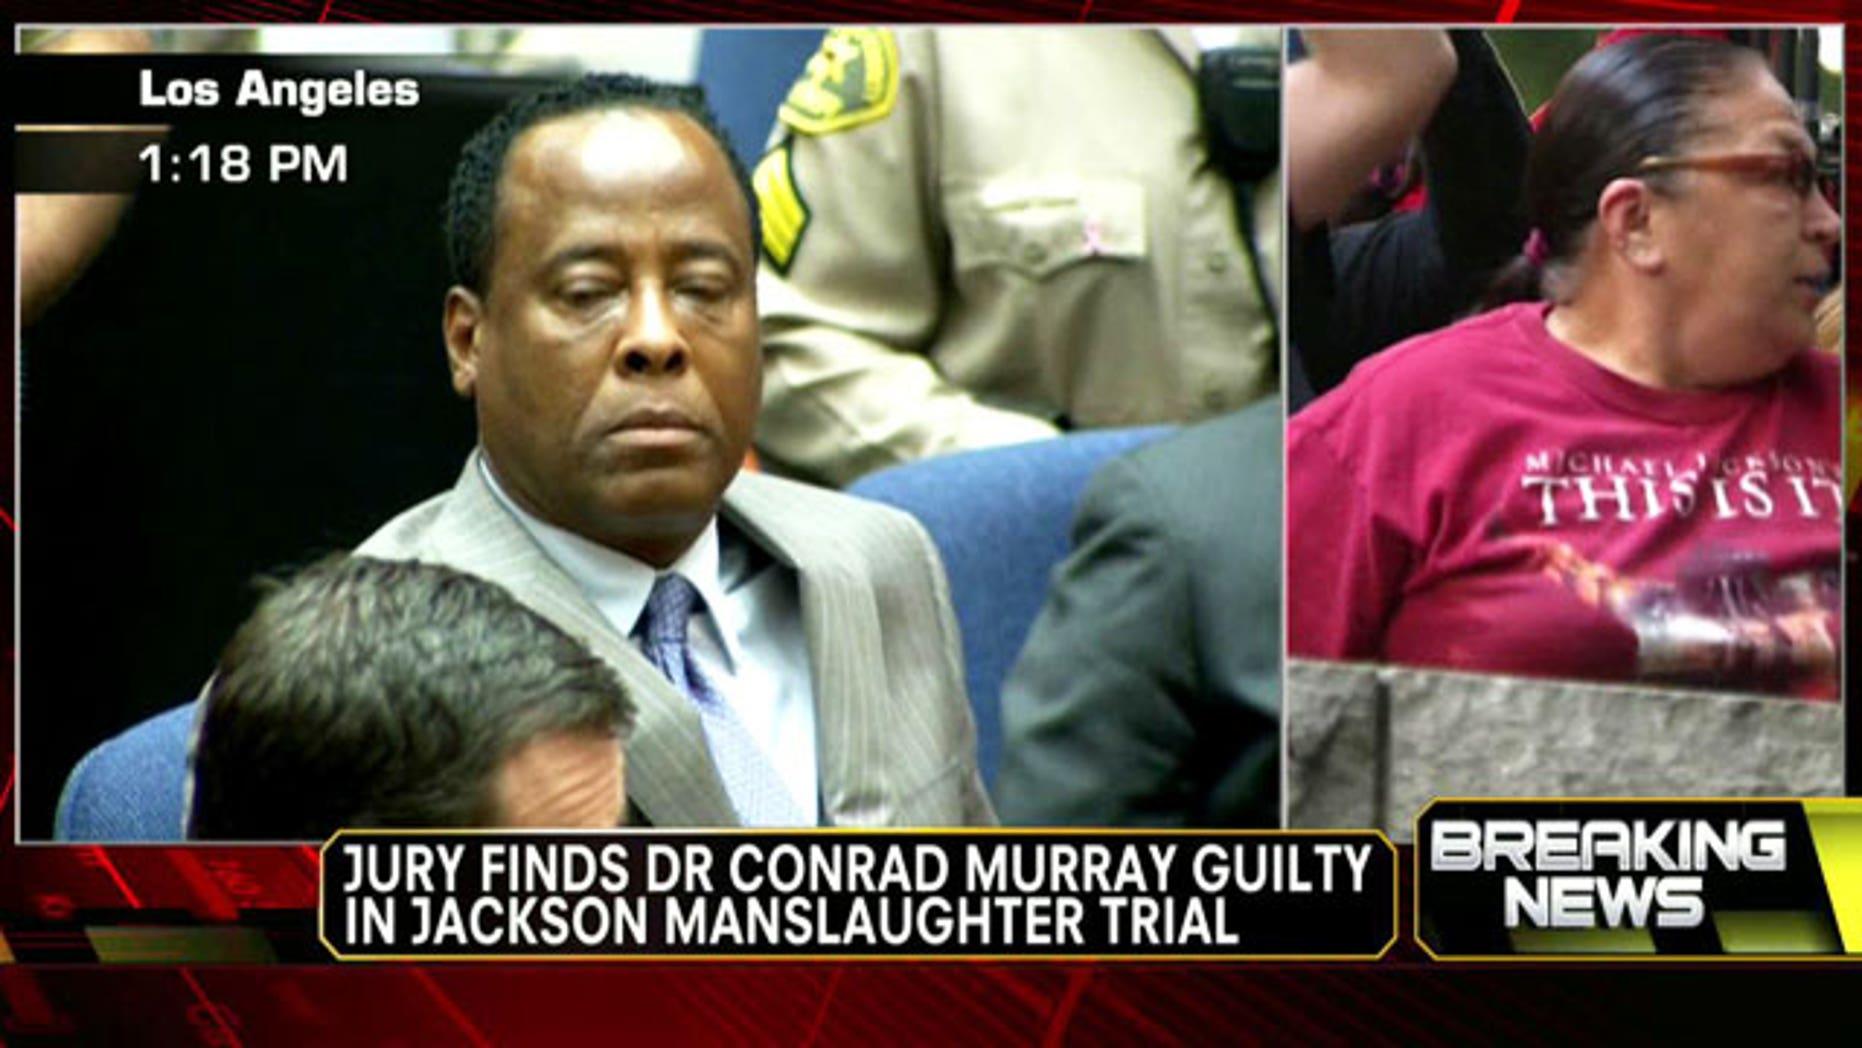 Nov. 7 2011: Dr. Conrad Murray reacts to the guilty verdict.